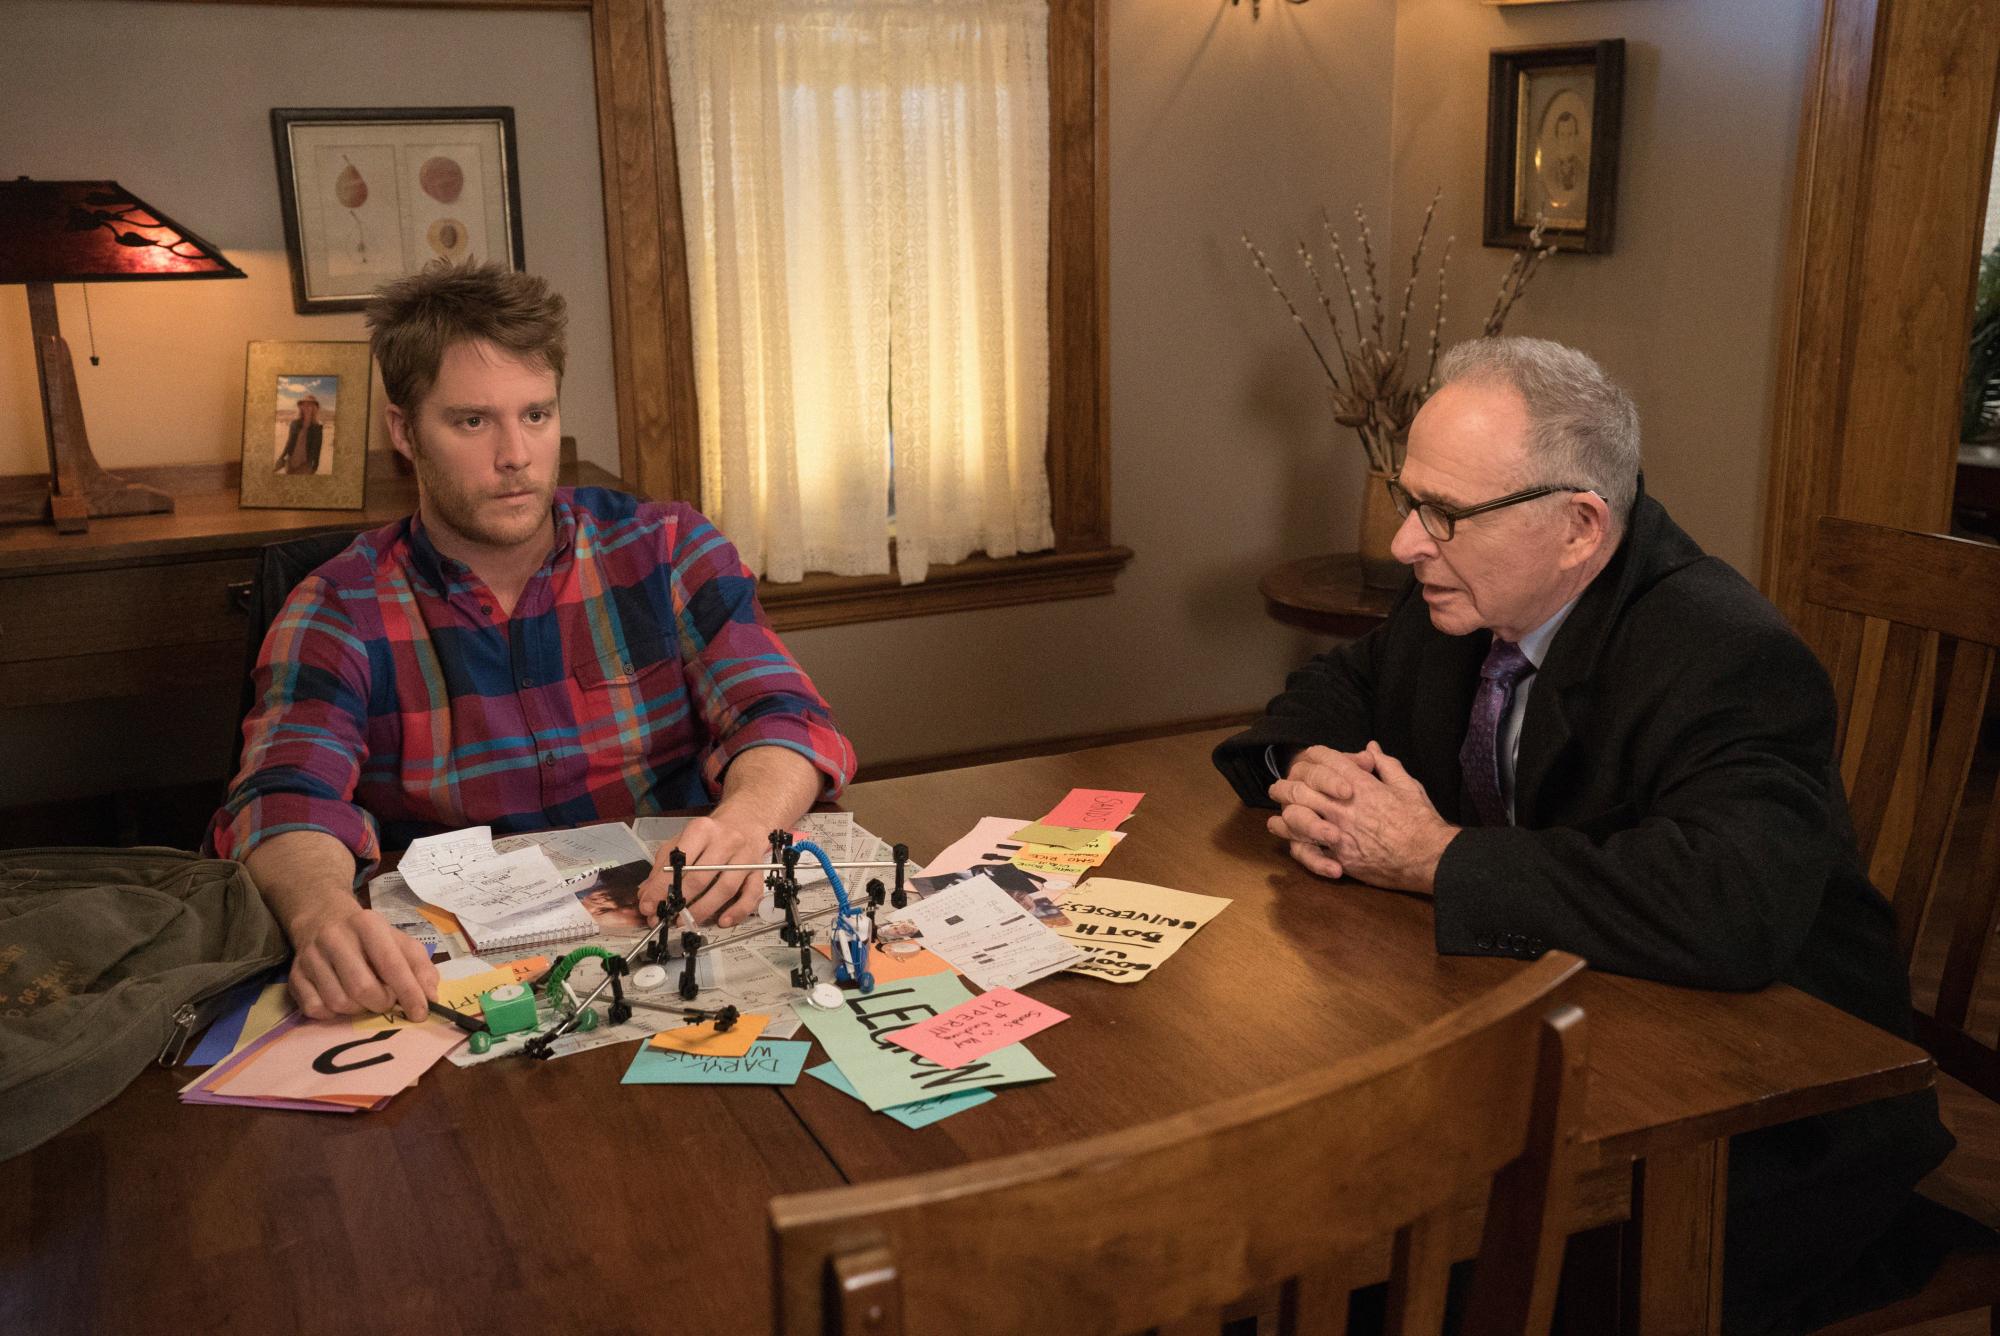 Jake McDorman as Brian Finch and Ron Rifkin as Dennis Finch